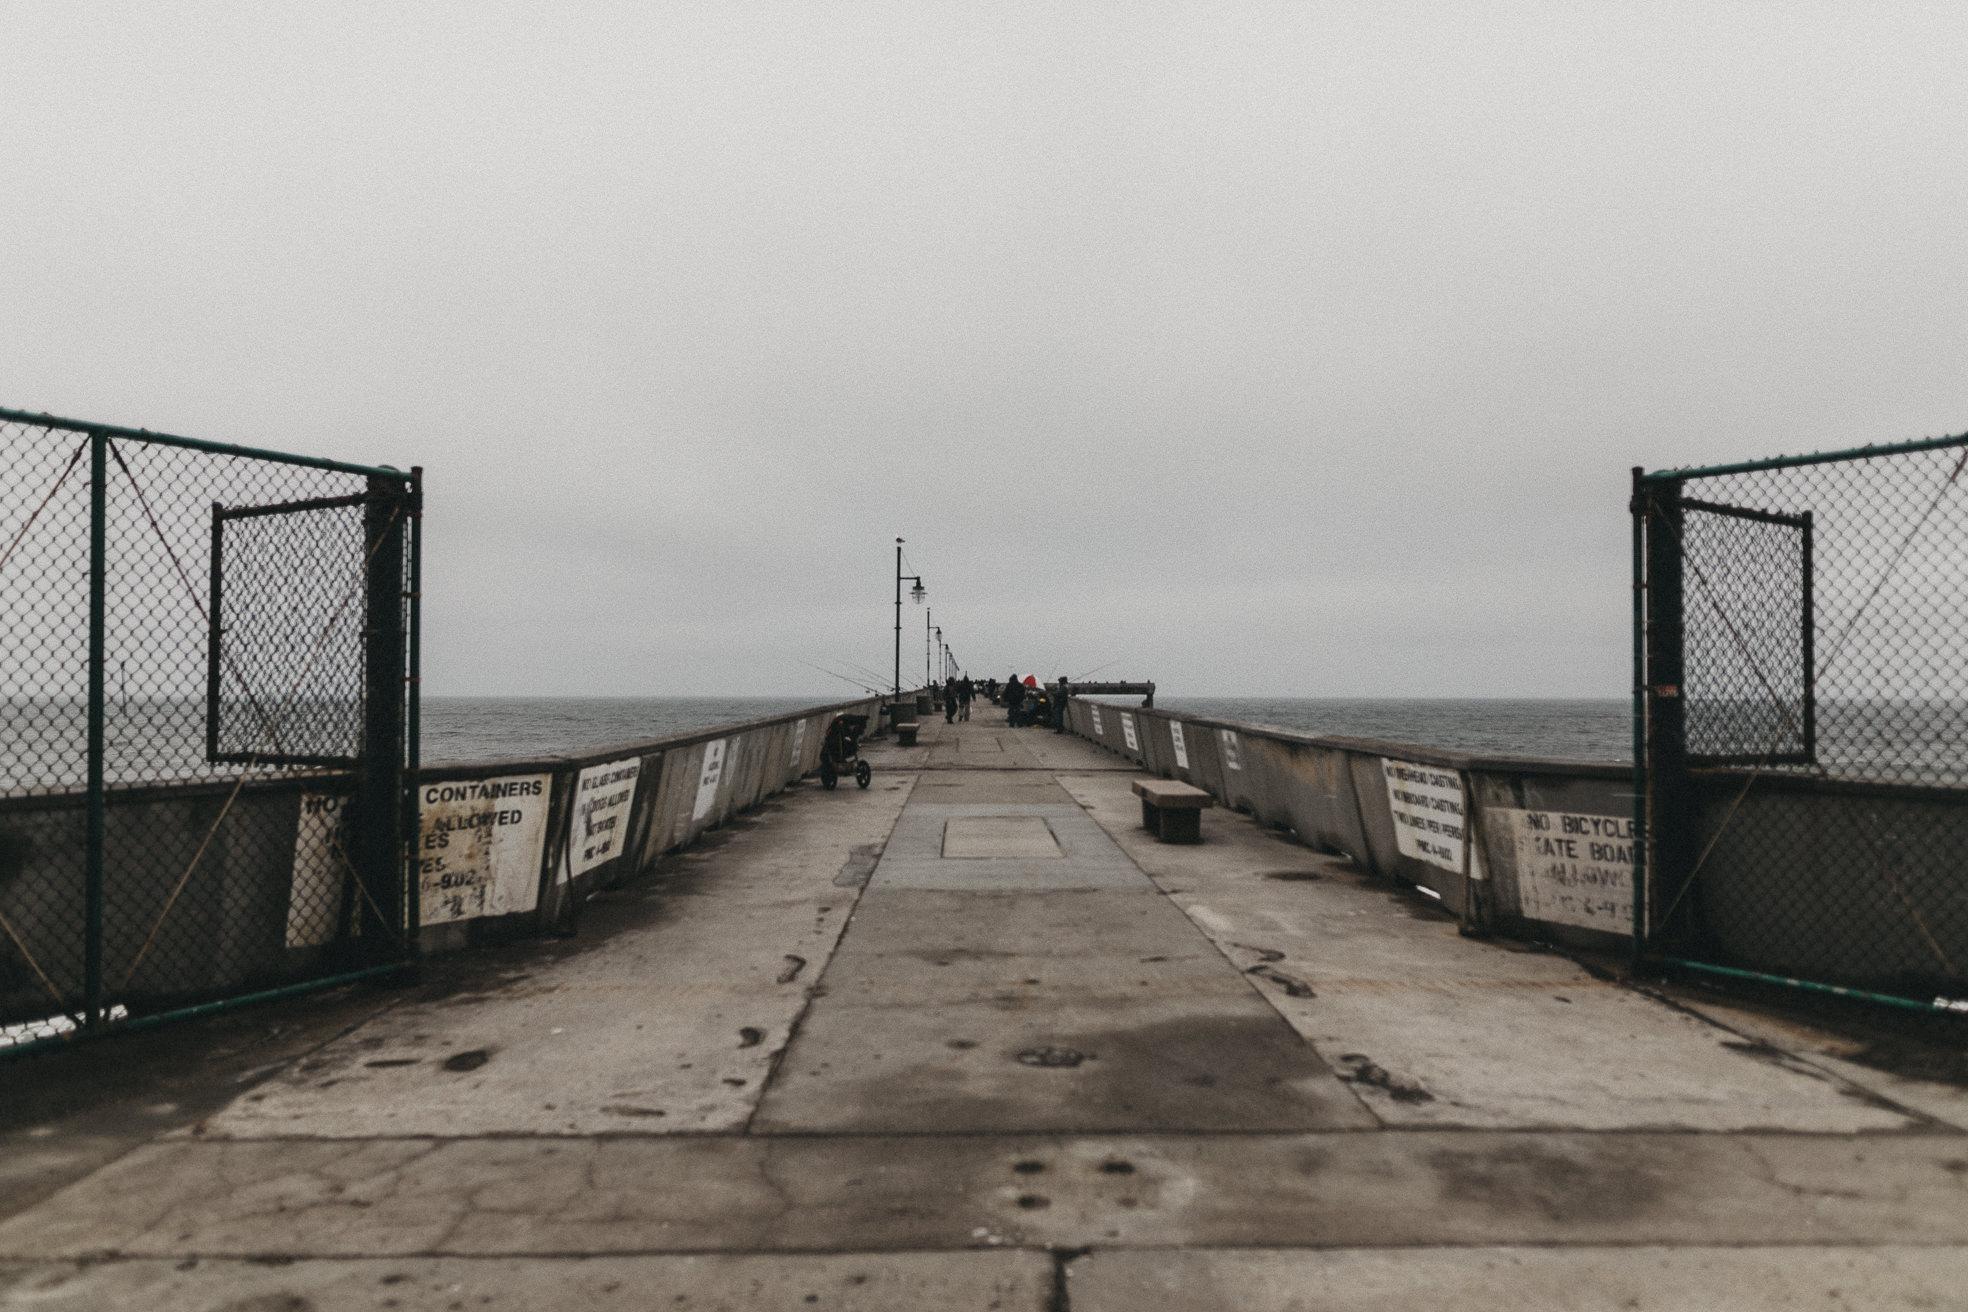 San-Francisco-BildervomLeben-9823